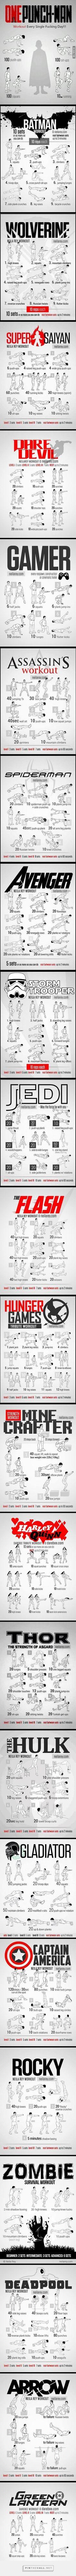 Makes workouts Fun! ☺☺  WWW.NEILAREY.COM